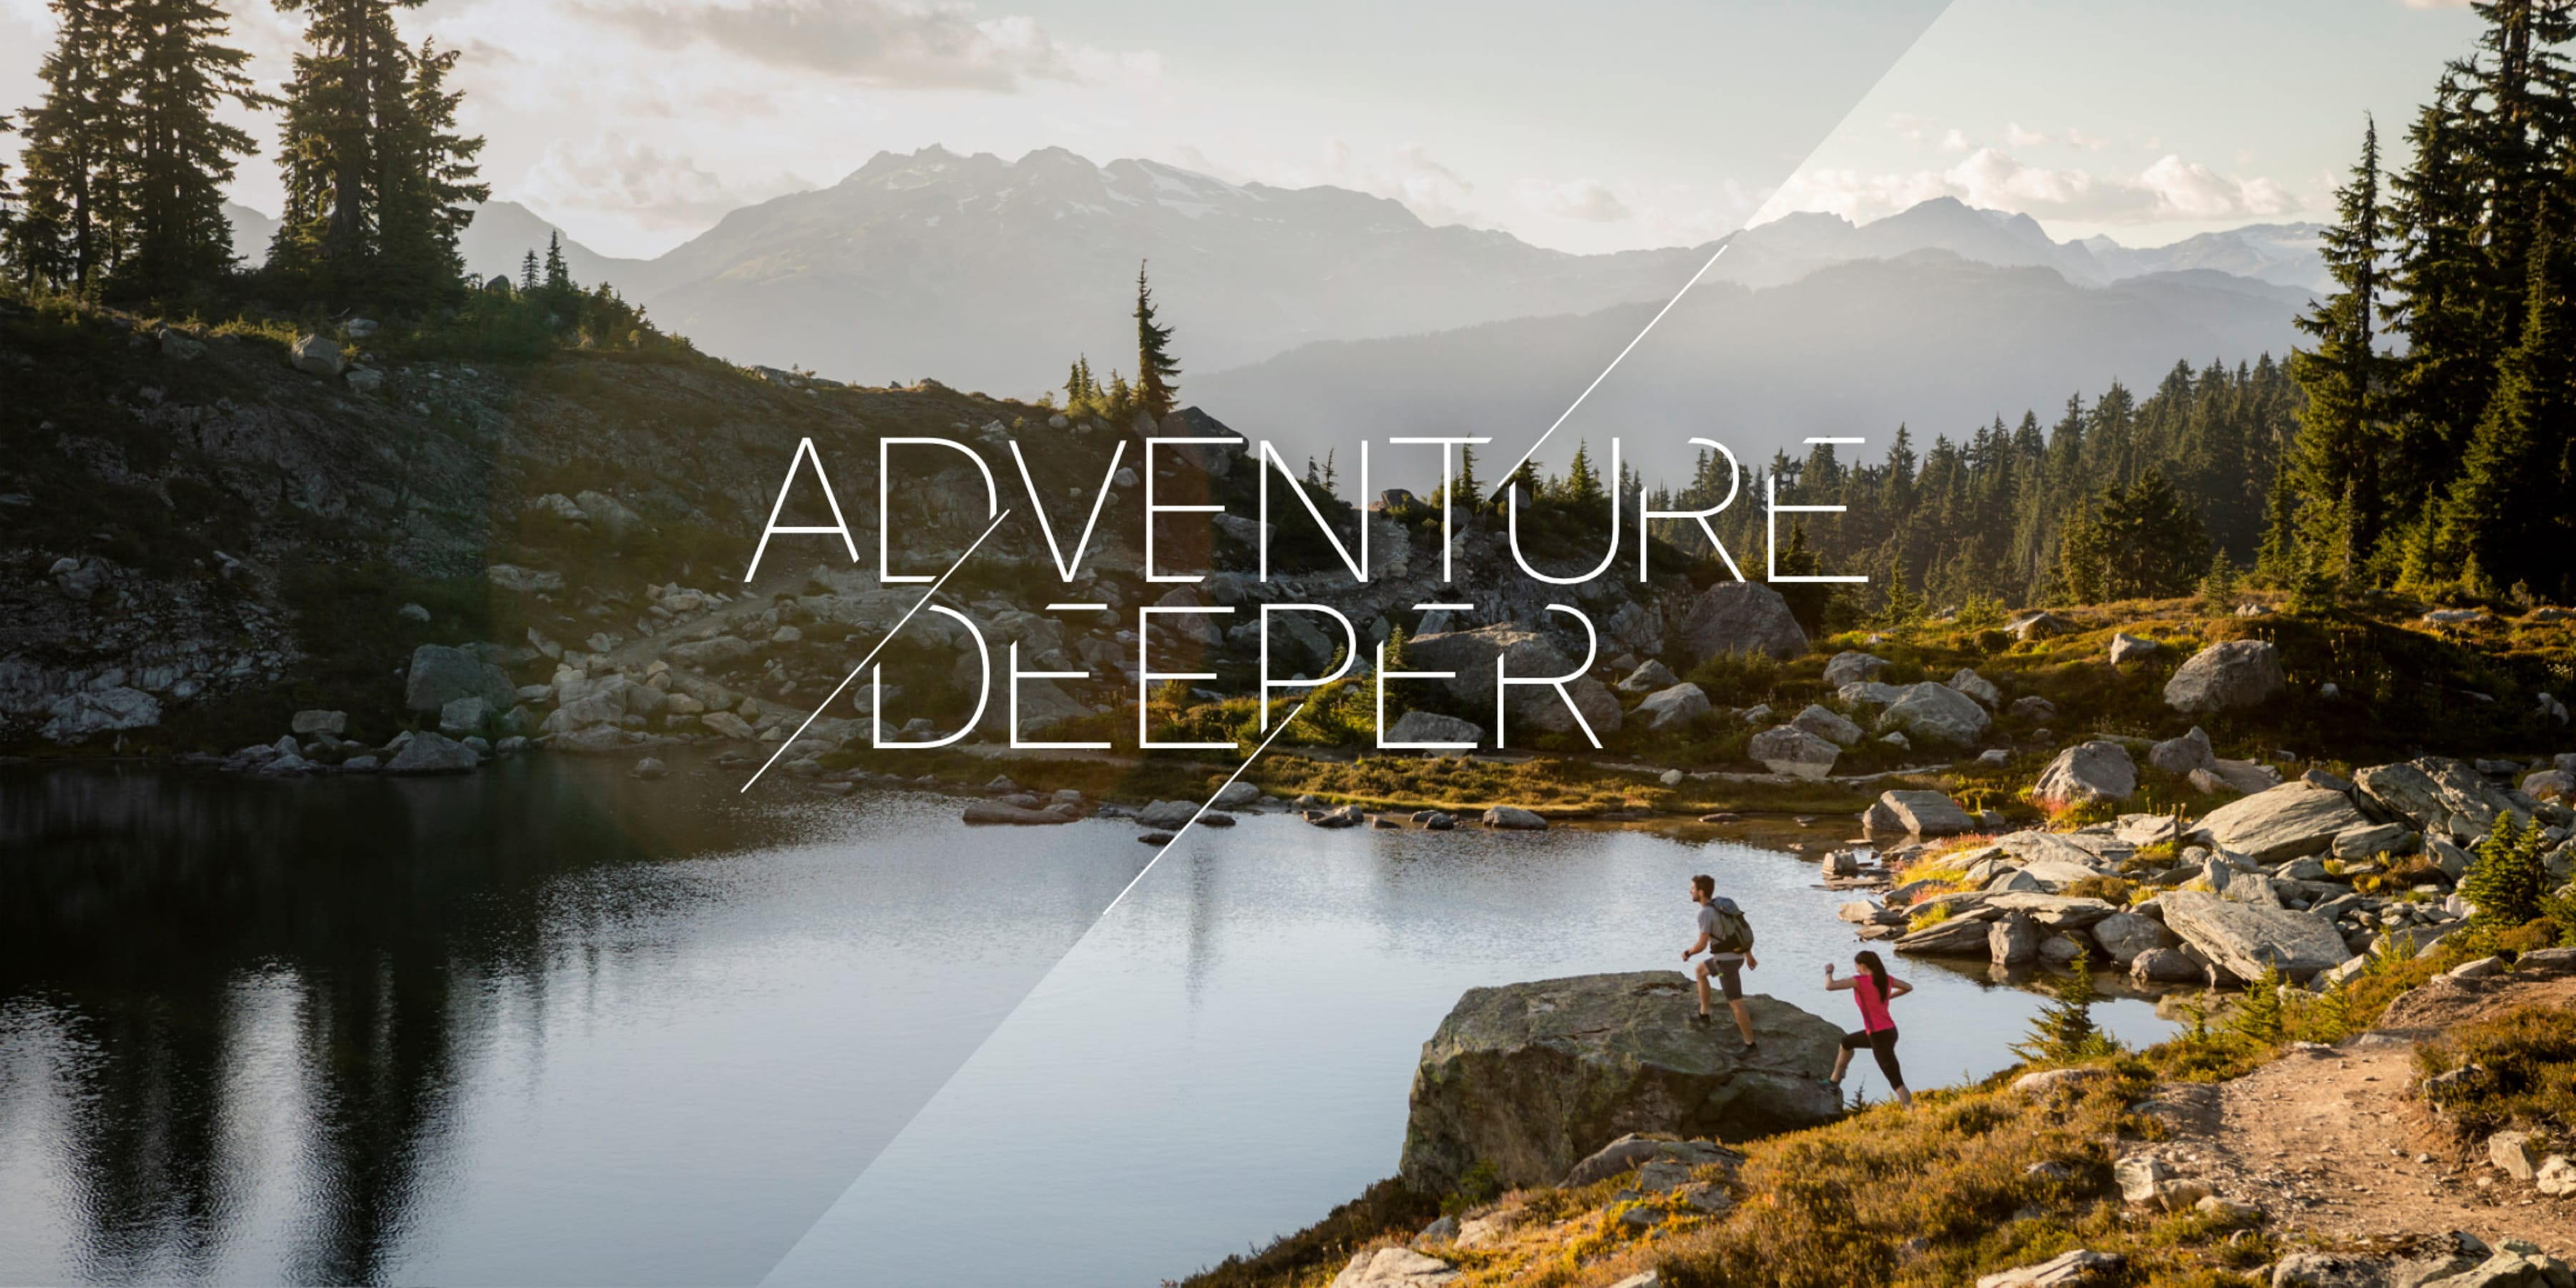 Adventure Deeper